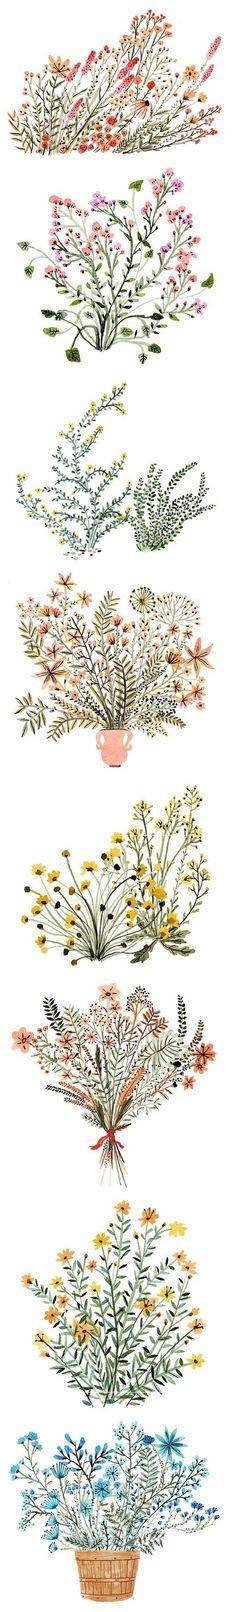 Dainty watercolor flowers, by Vikki Chu #art #journal Floral illustration design